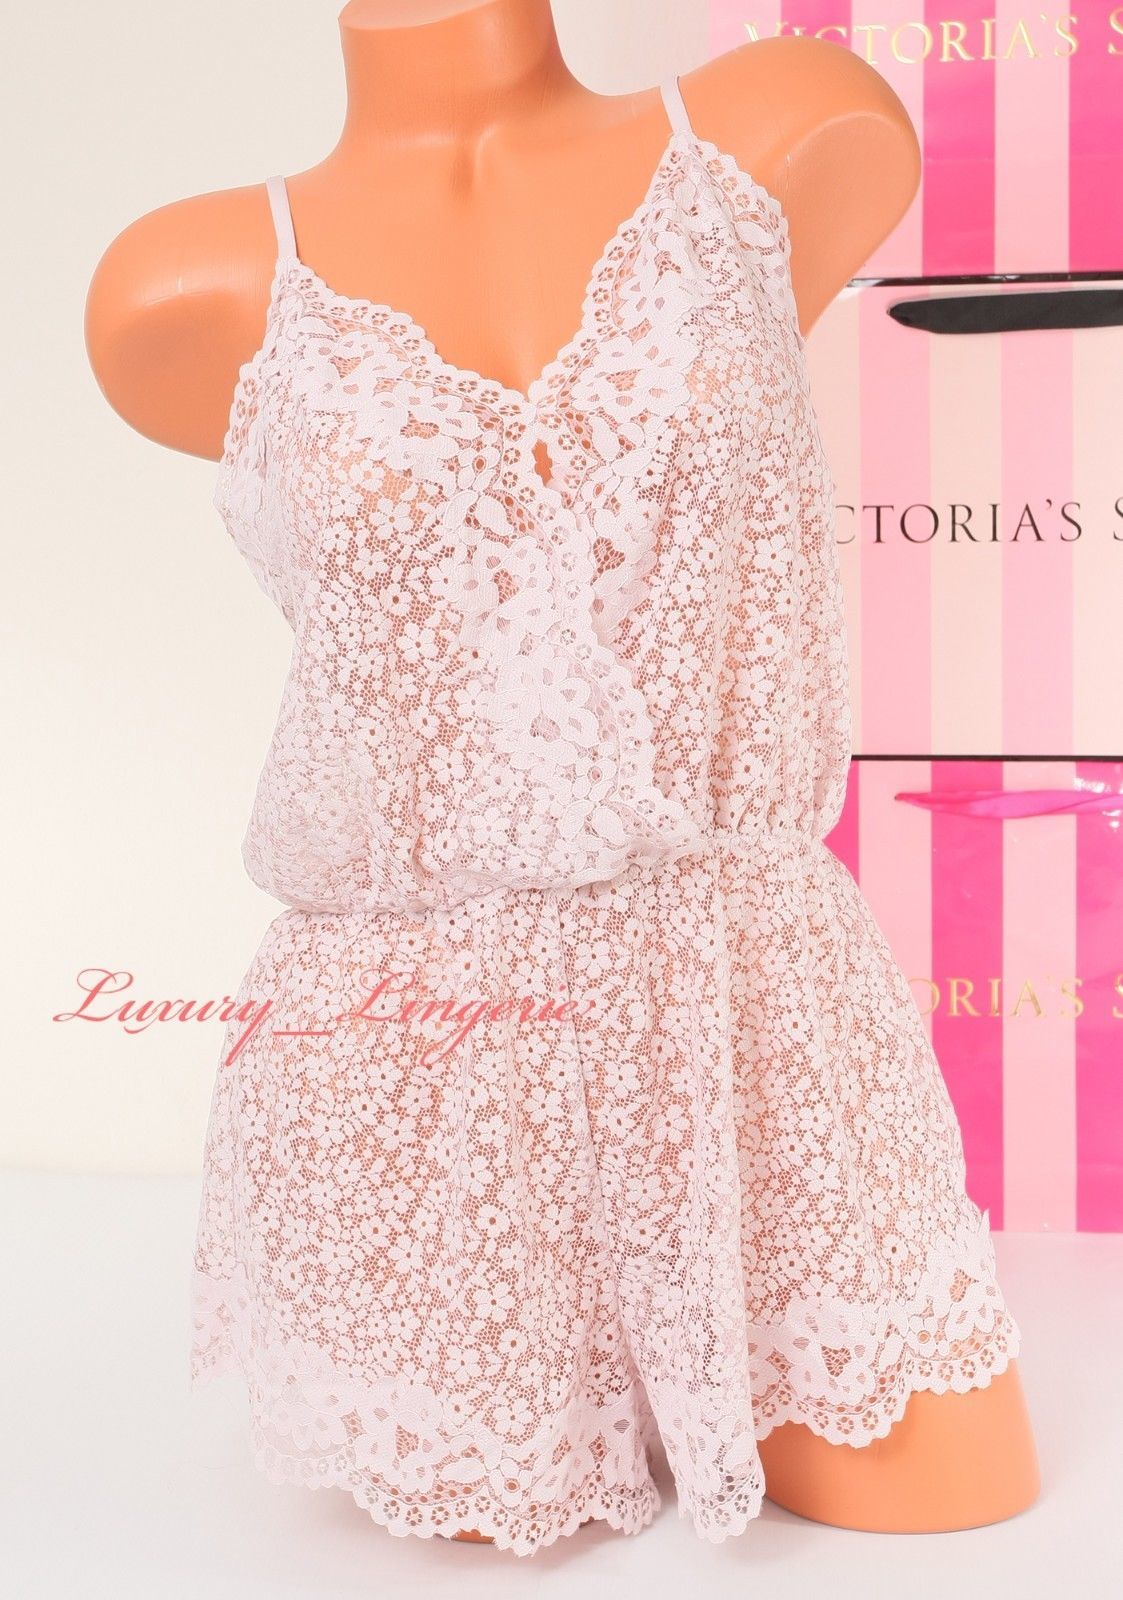 847c9b74698 VS Victoria s Secret Floral Lace Flattering and 50 similar items. 57